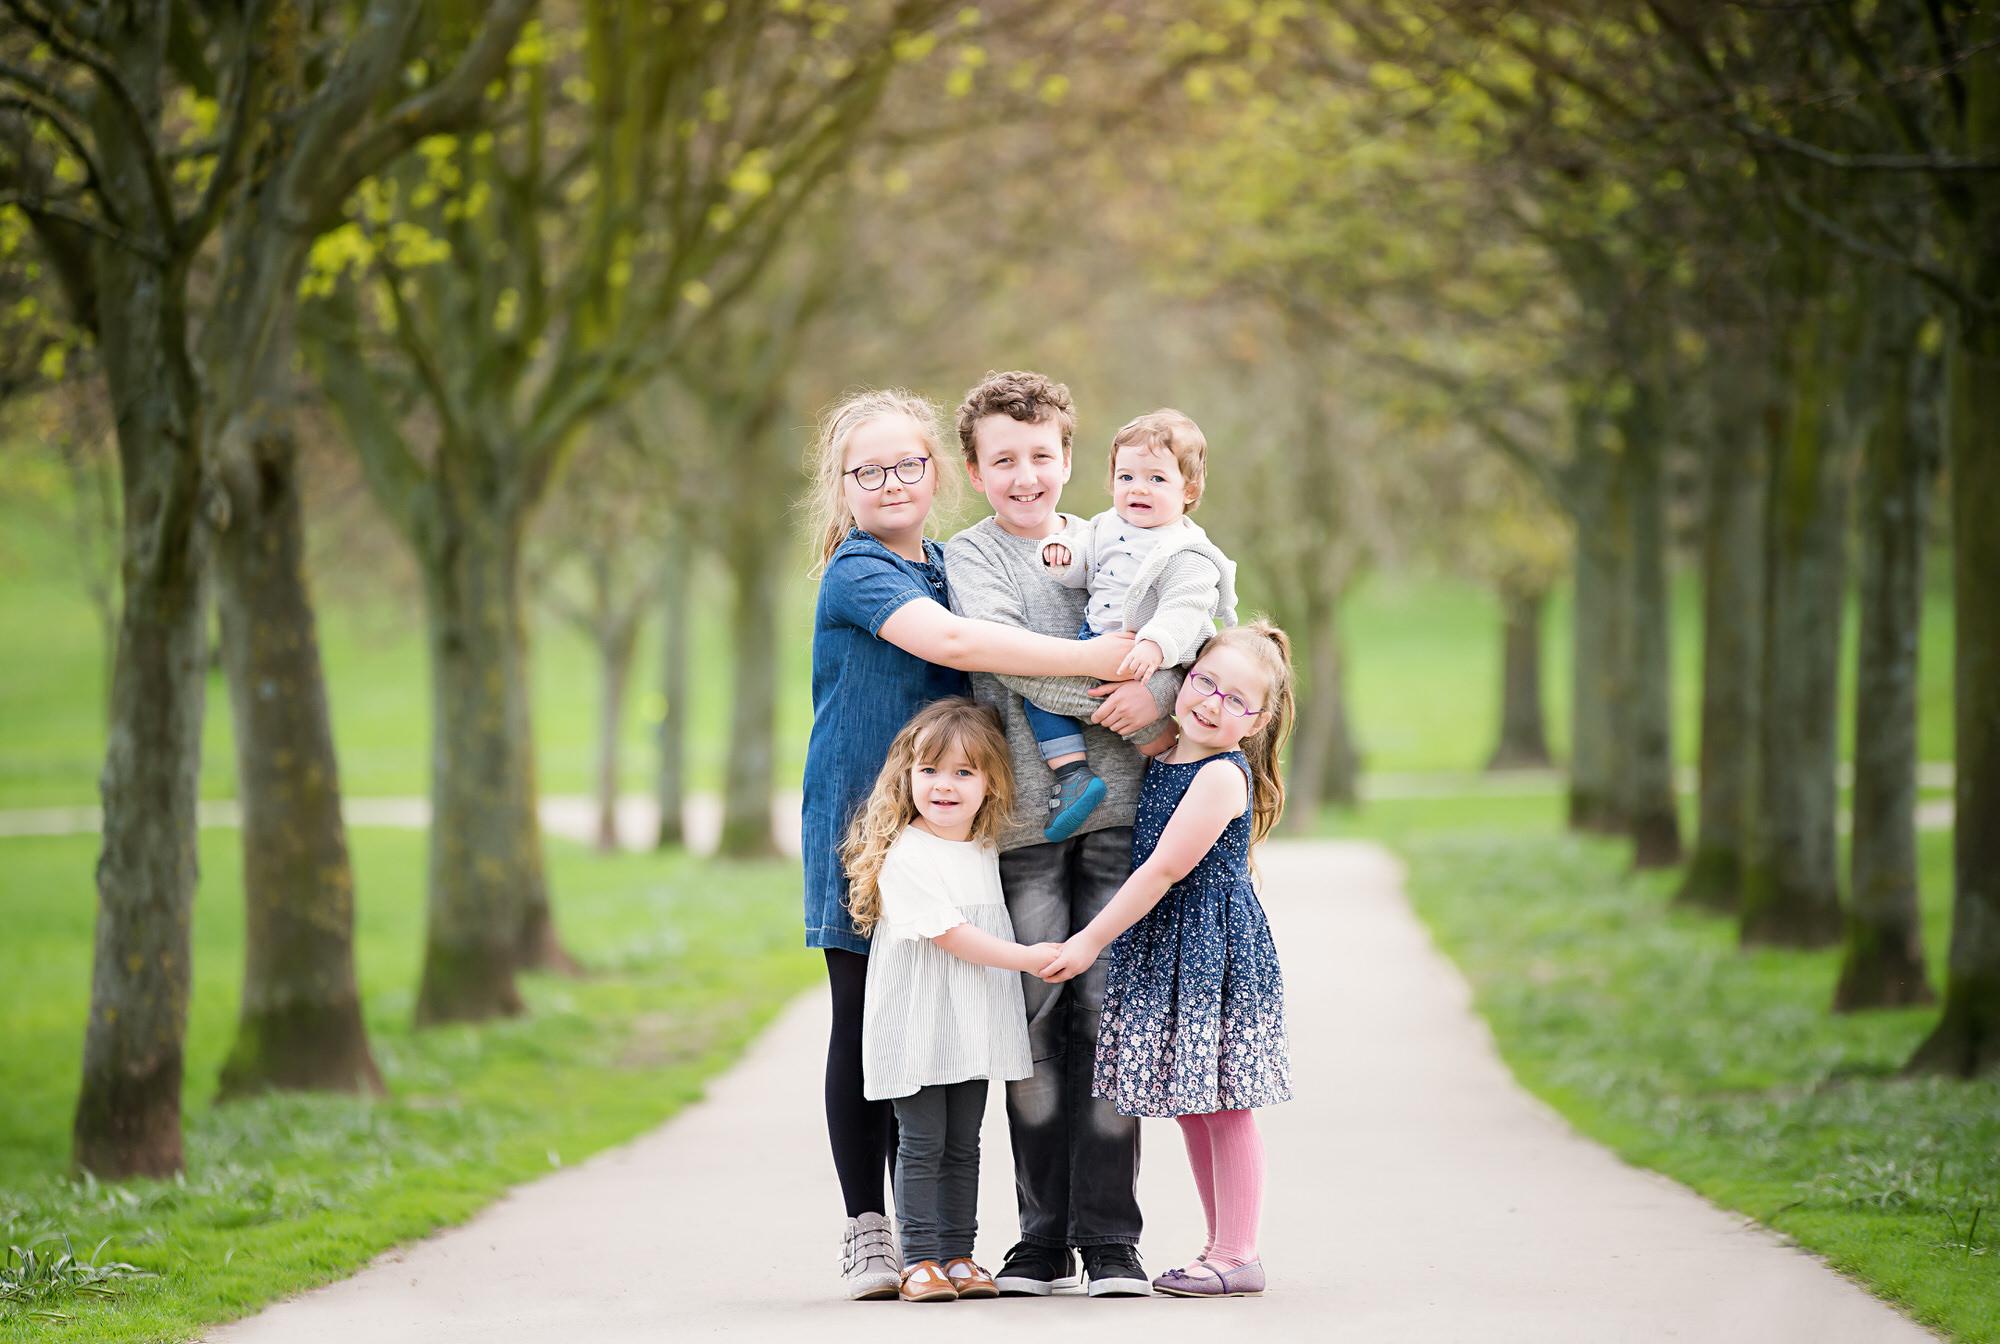 Family outdoor photoshoot, Barnsley family photographer, Yorkshire